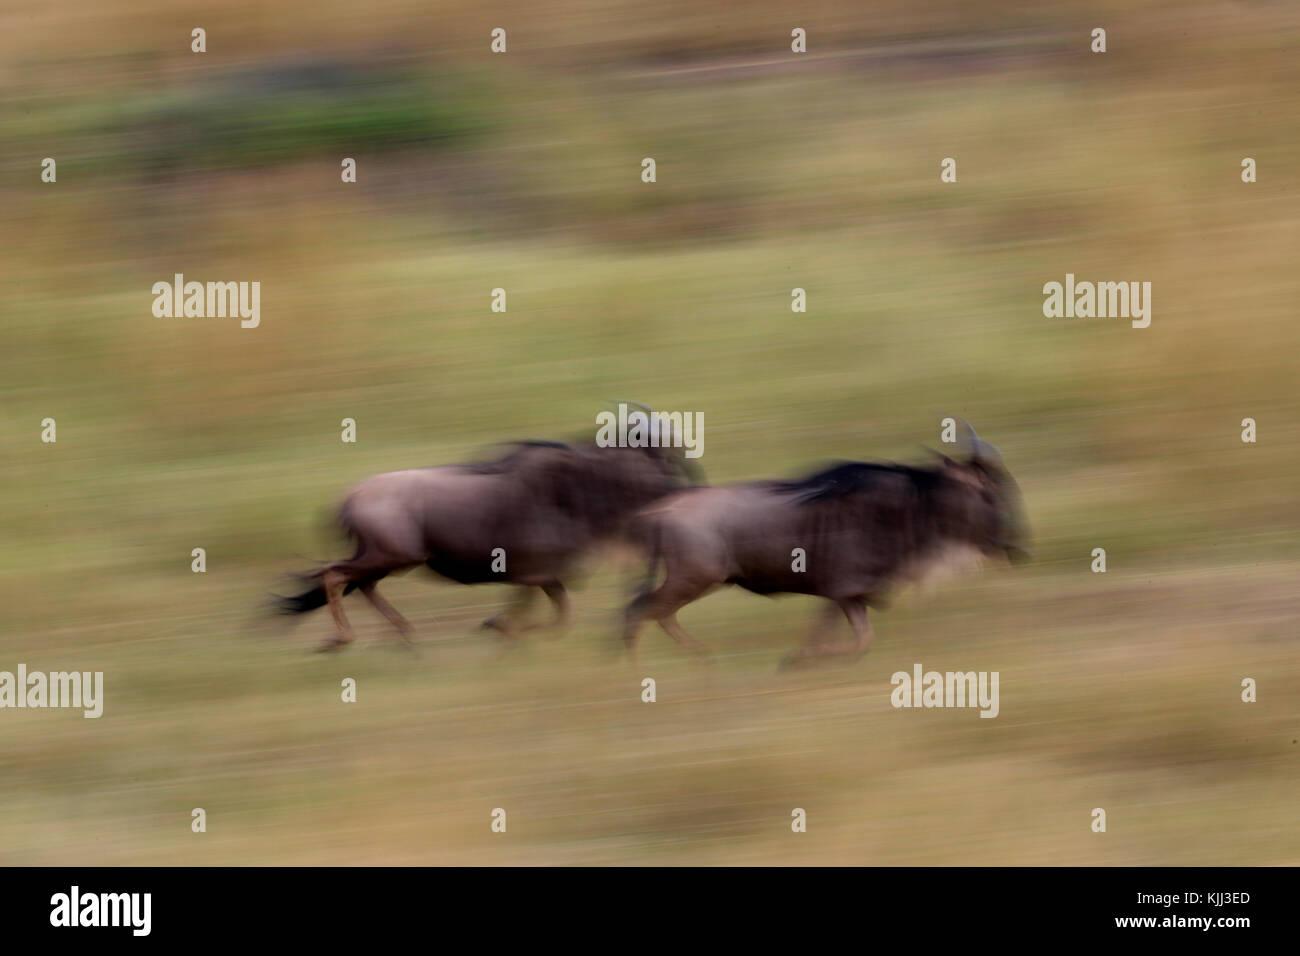 Motion Blur von 2 laufende Gnus (connochaetes Taurinus) im hohen Gras. Masai Mara Game Reserve. Kenia. Stockbild